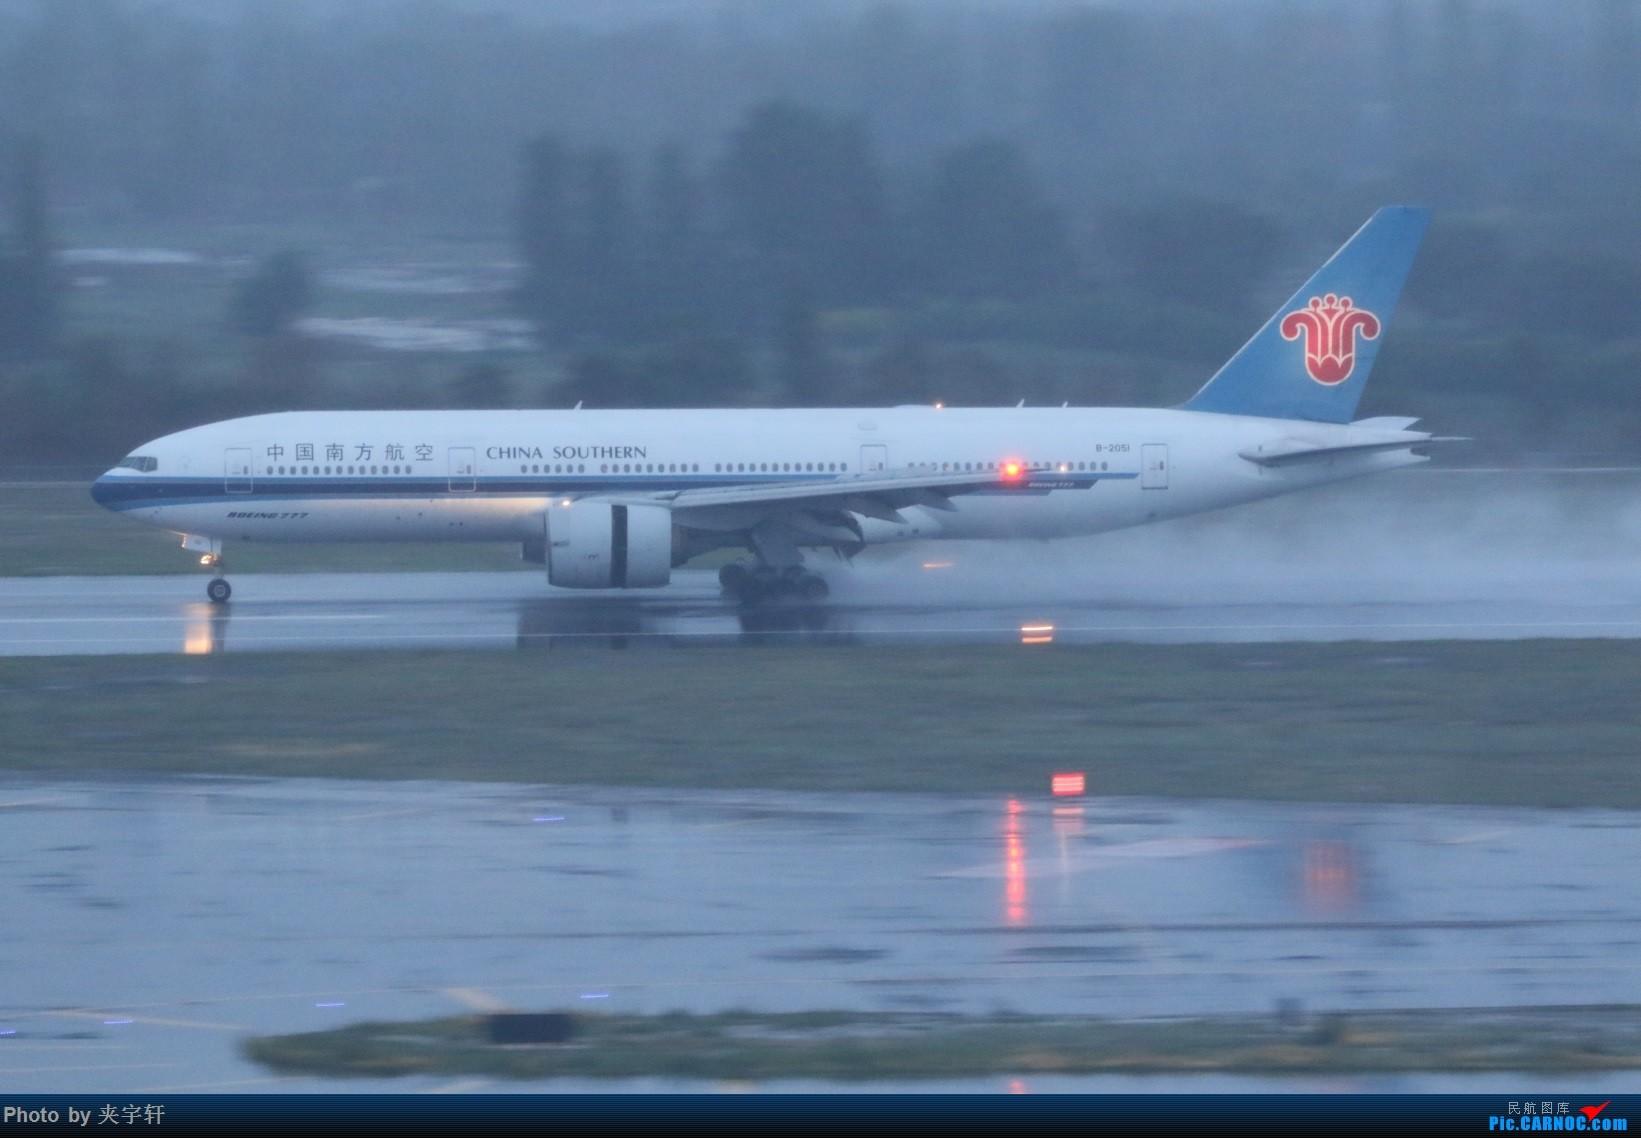 Re:[原创]【URC】雨天动图!+吹水 BOEING 777-200 B-2051 中国乌鲁木齐地窝堡国际机场